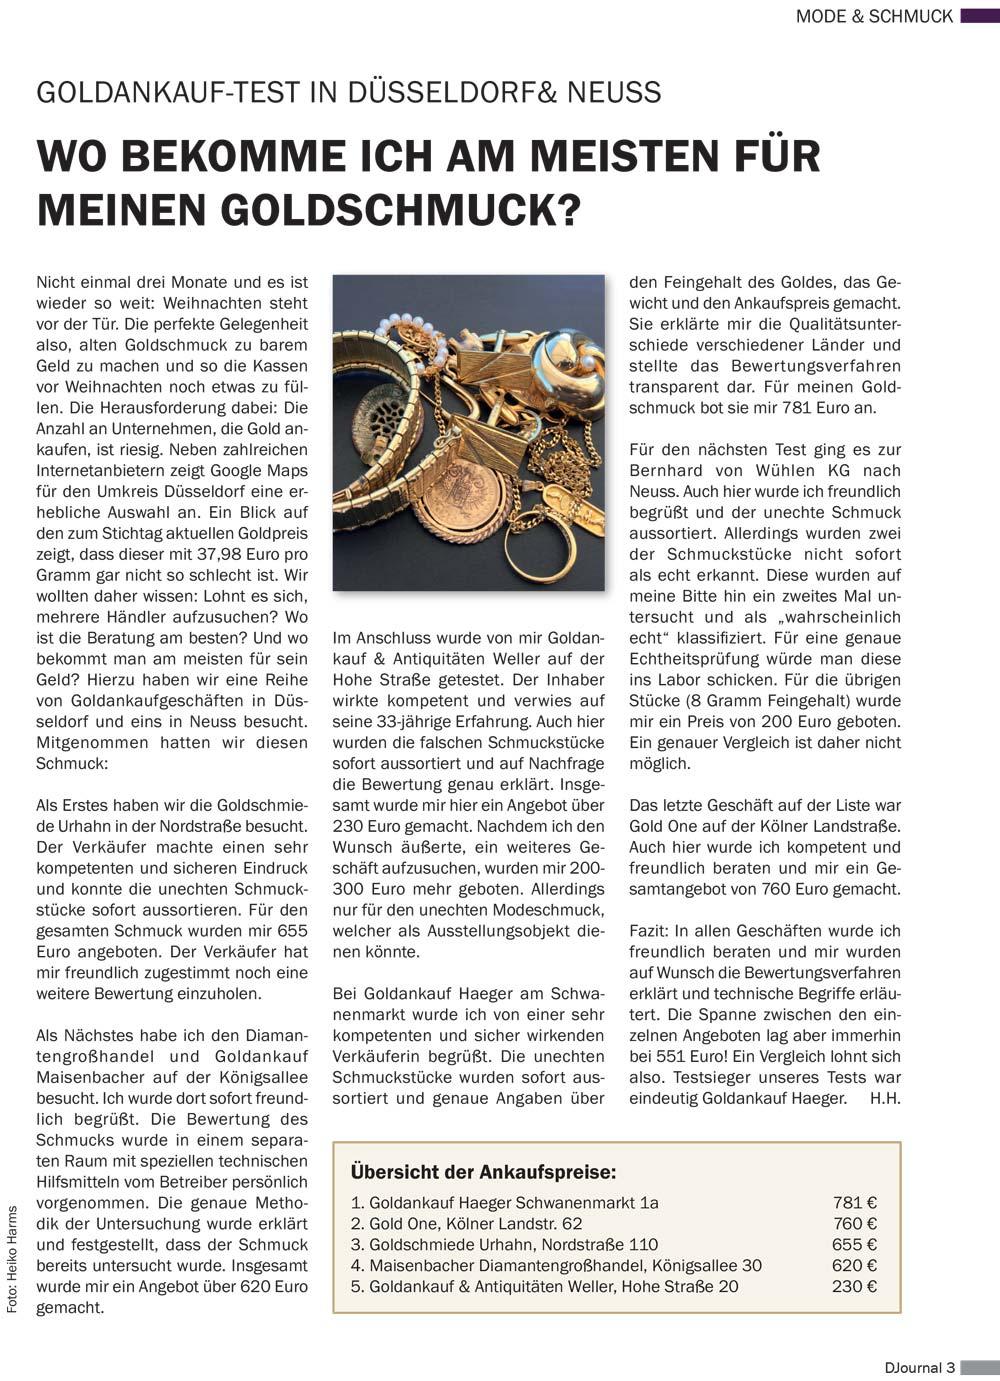 Die Haeger GmbH im Djournal